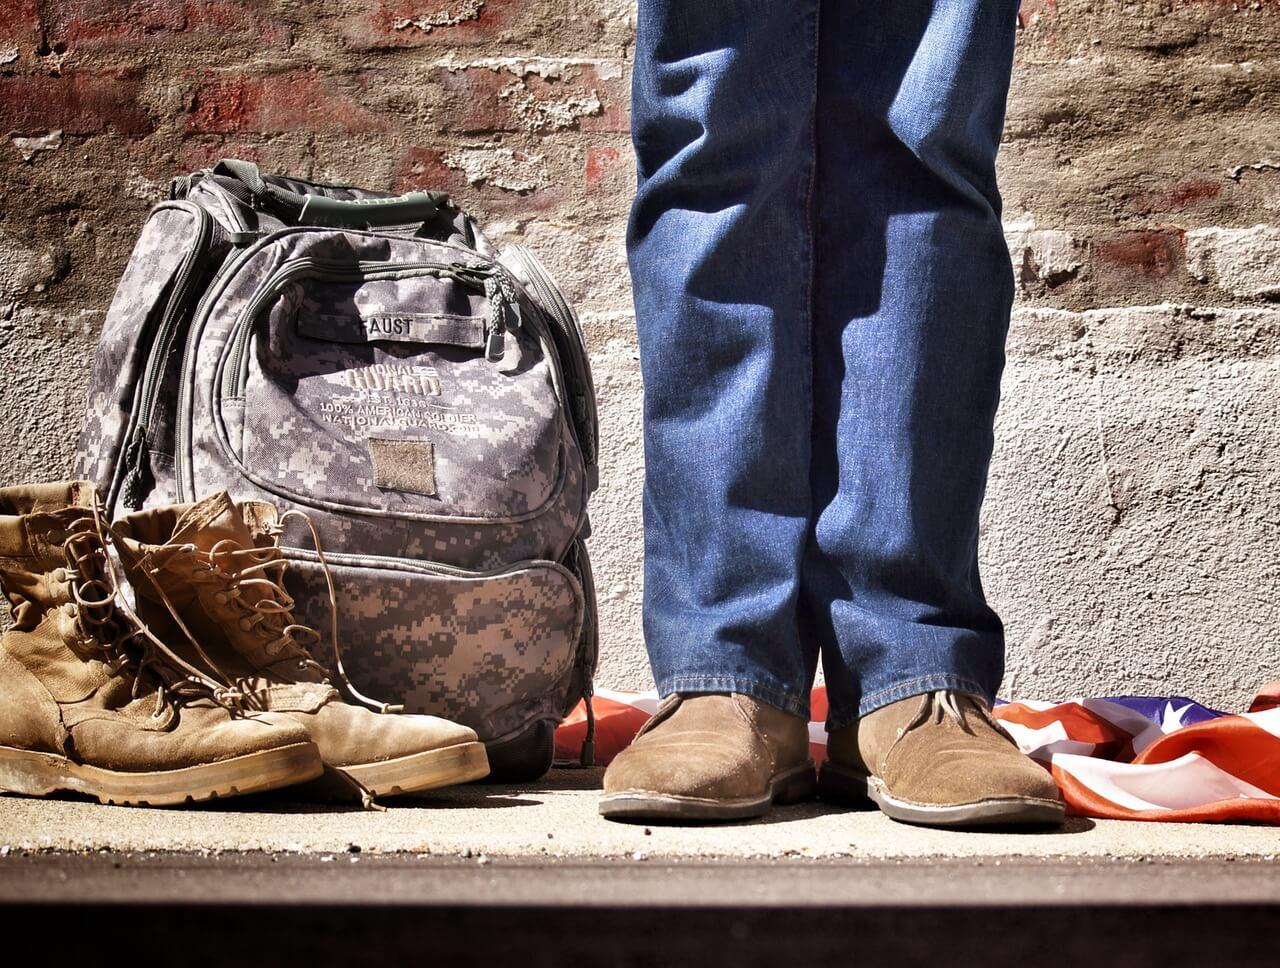 Improving Employment Opportunity for Veterans